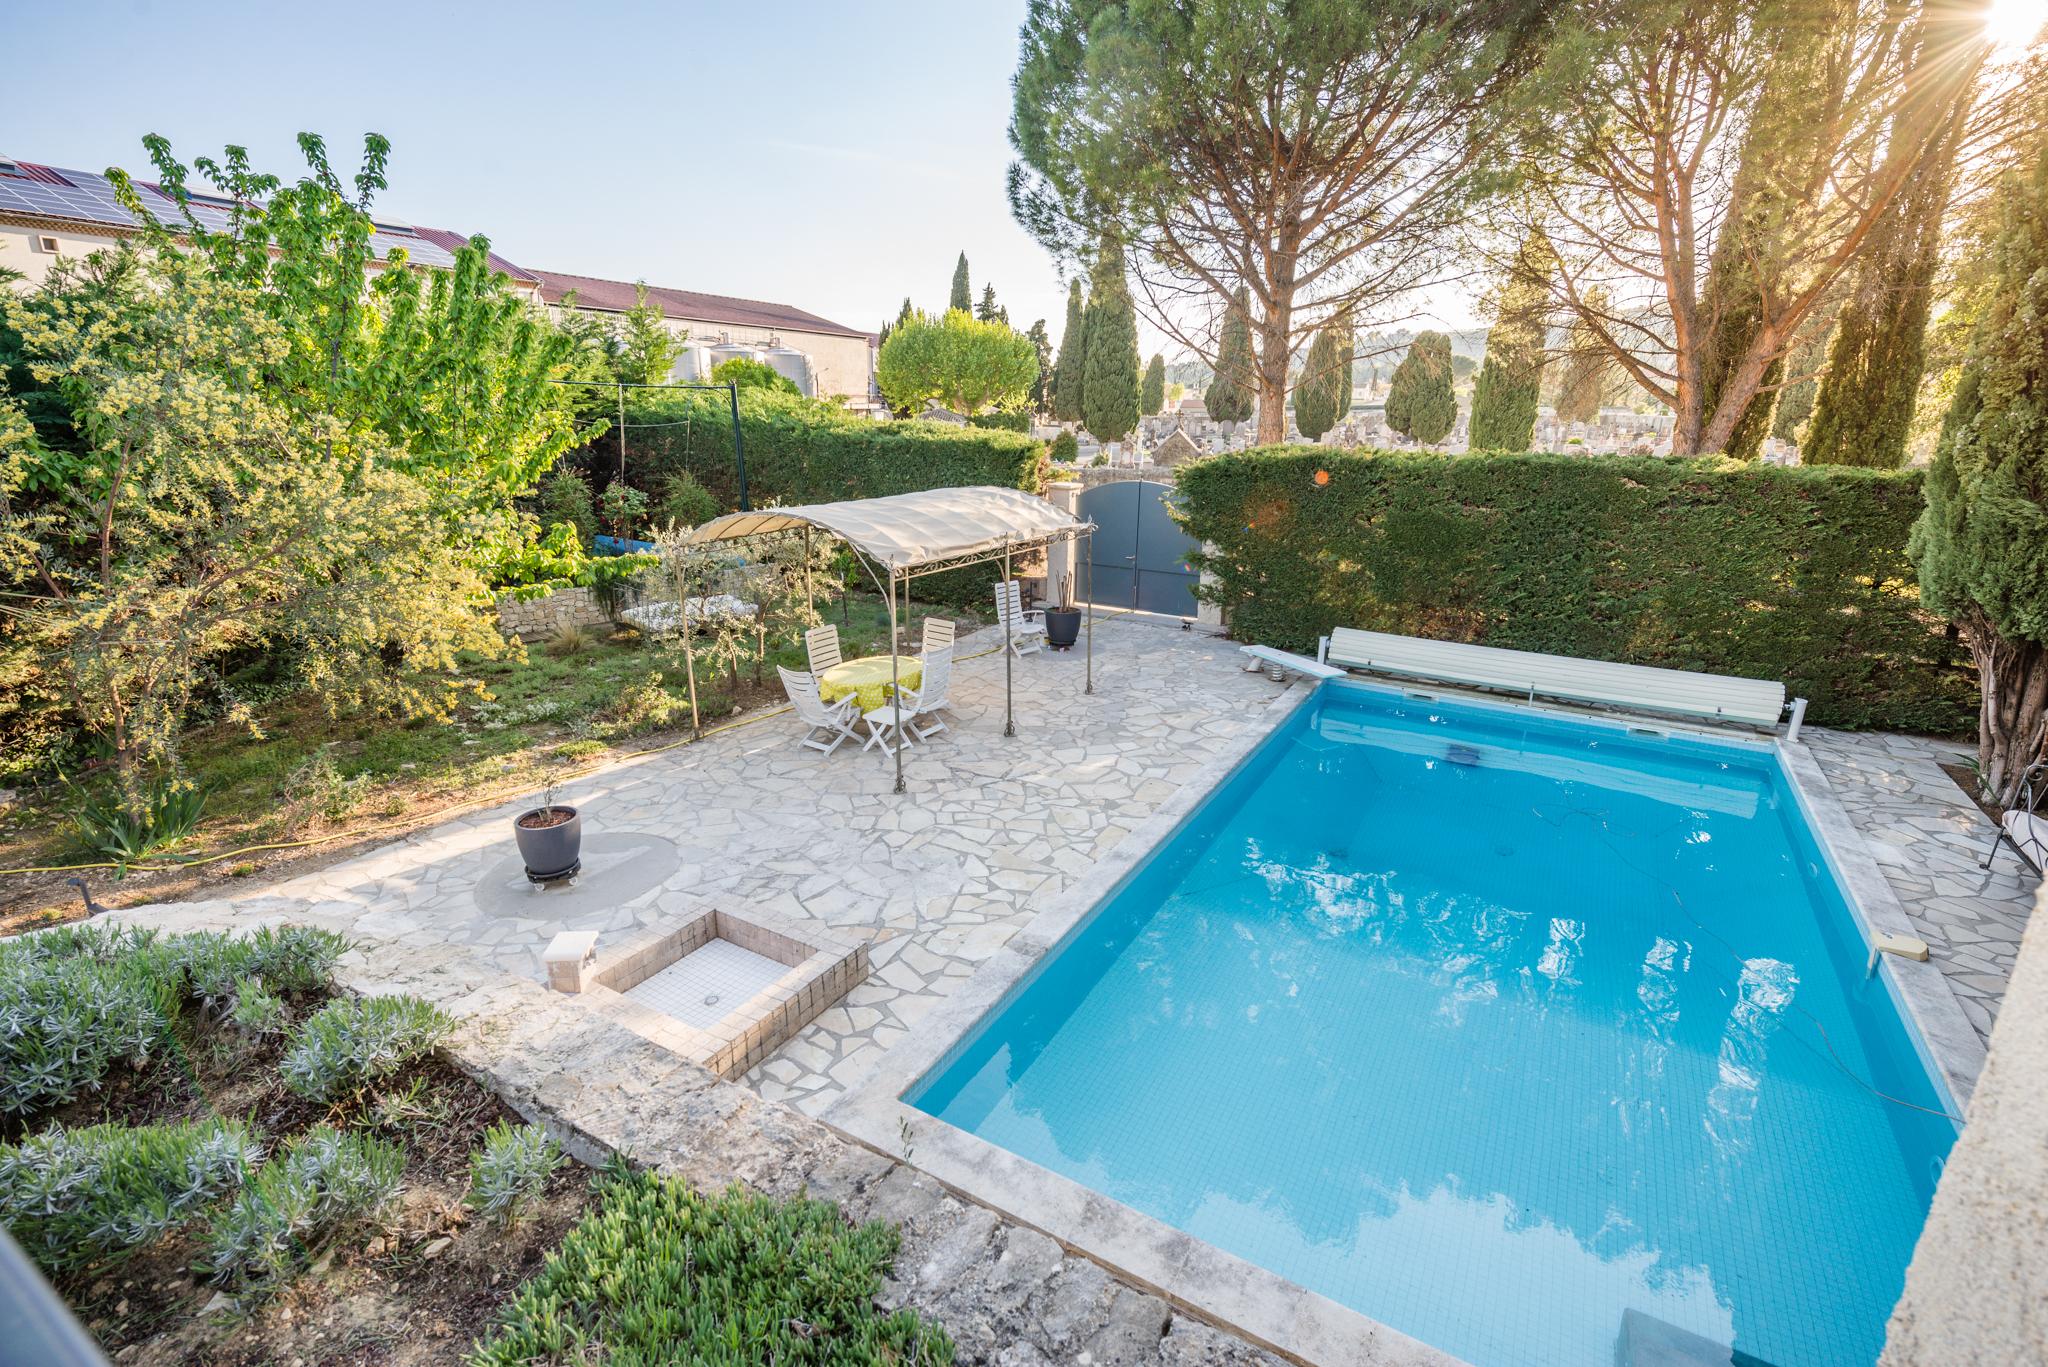 feriebolig-provence-privat-pool-DSC_4661.jpg